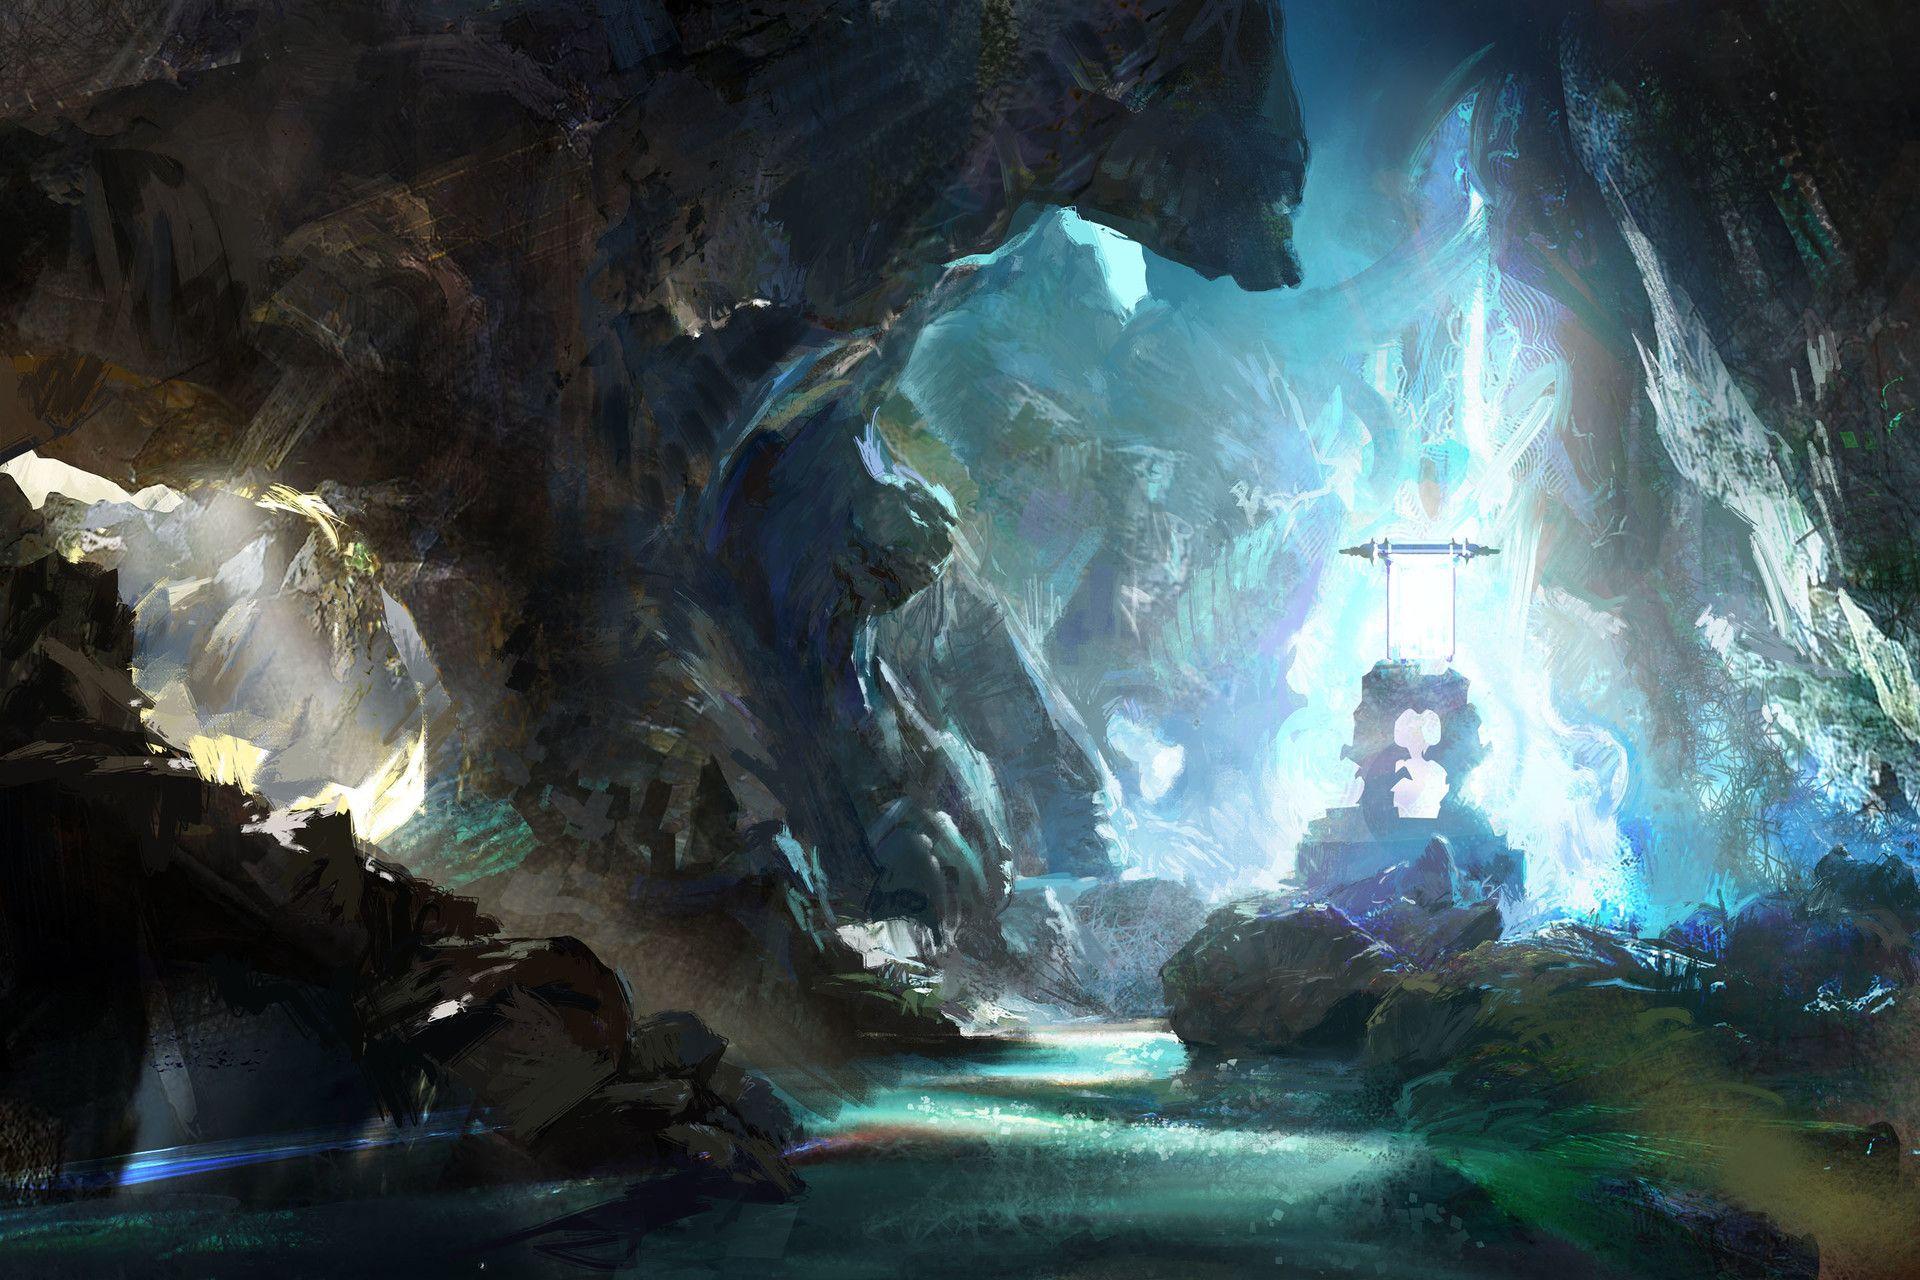 ArtStation - magic cave, hongqi zhang